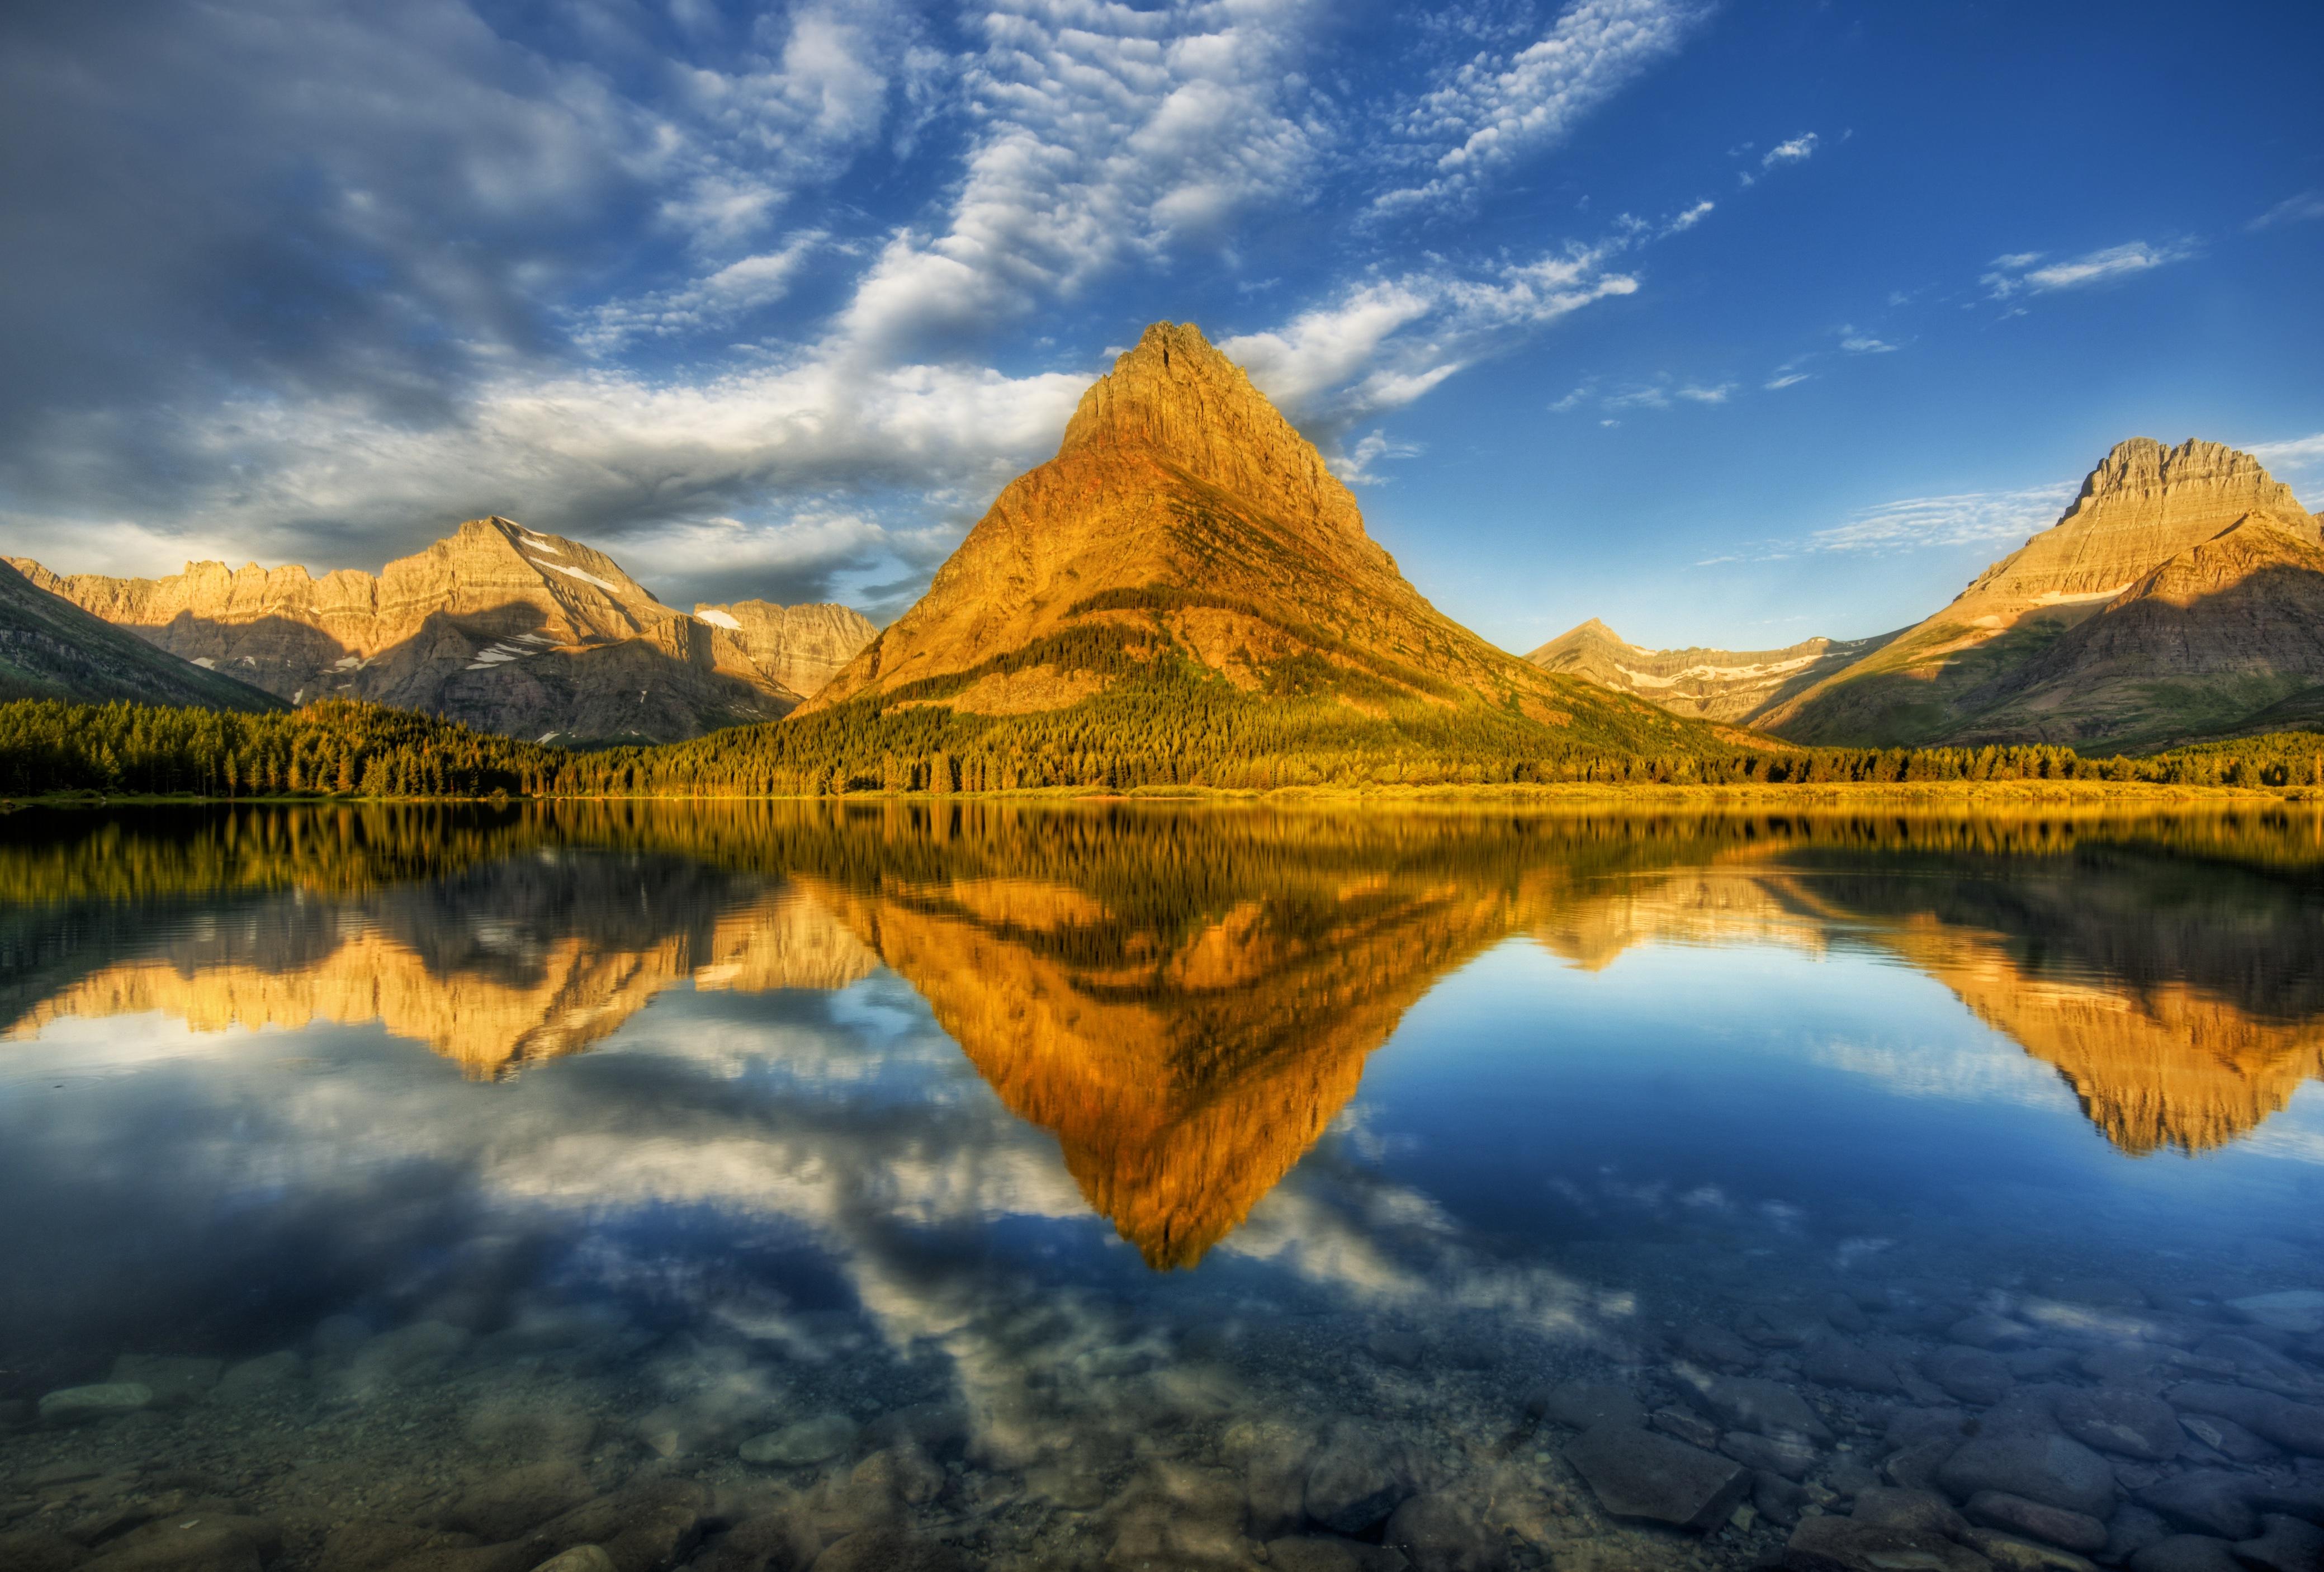 landscape wallpaper reflection.